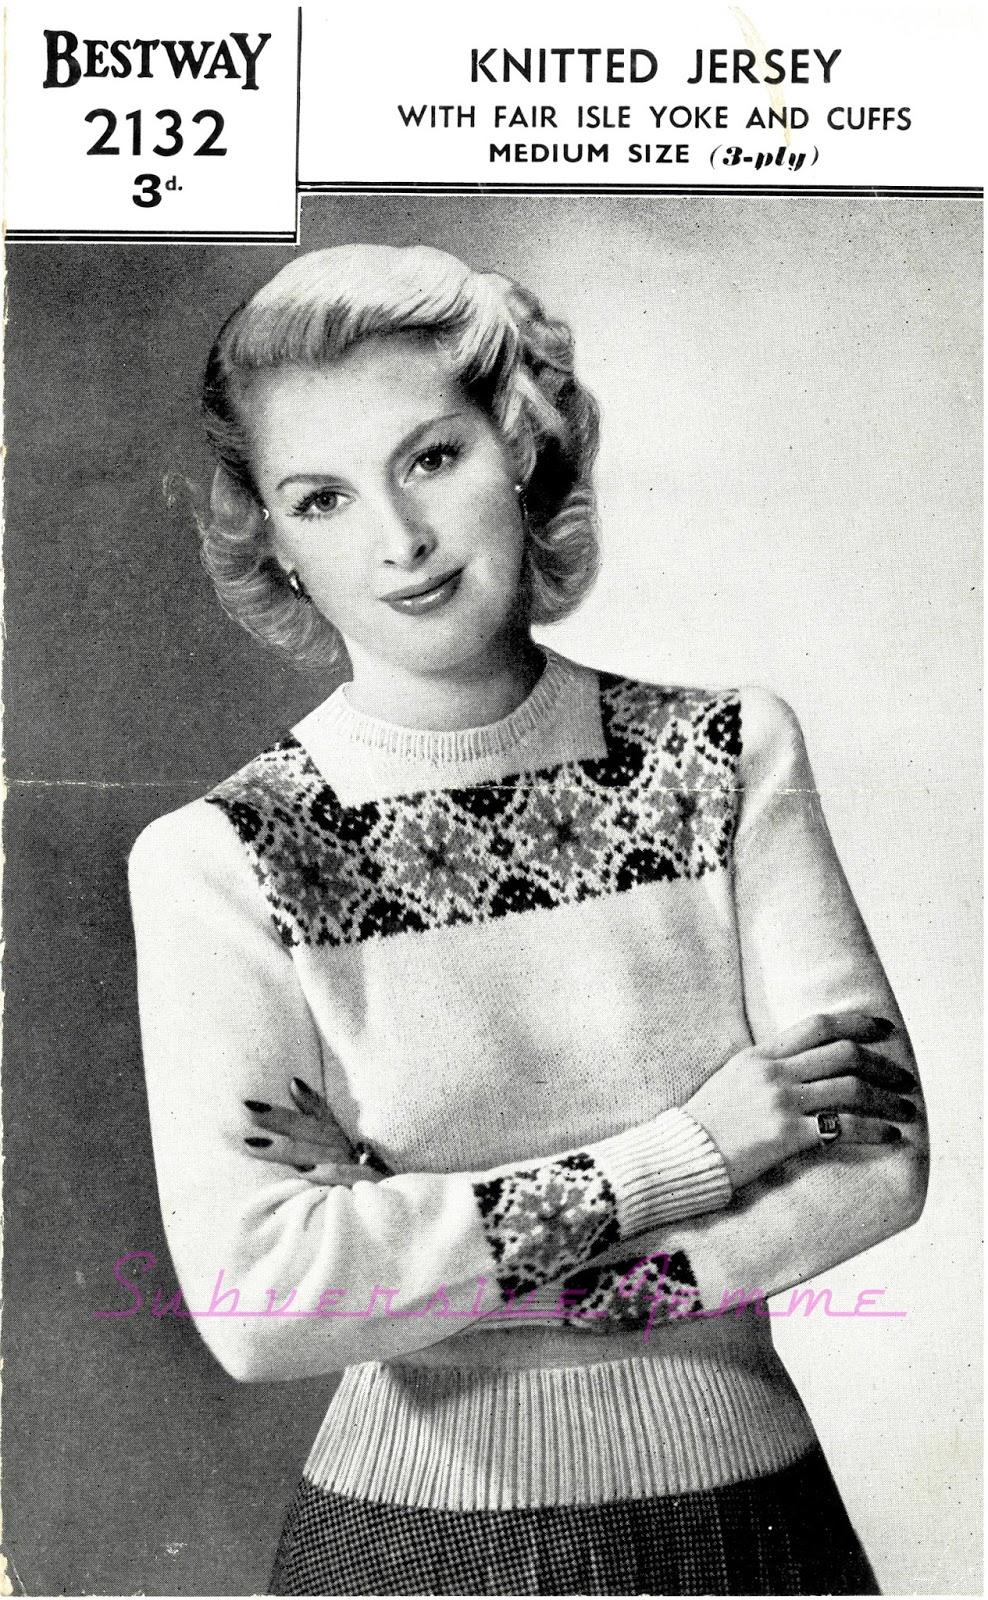 Free Vintage Knitting Patterns 1940s : The Vintage Pattern Files: 1940s Knitting - Bestway 2132 A Fair Isle Jumper